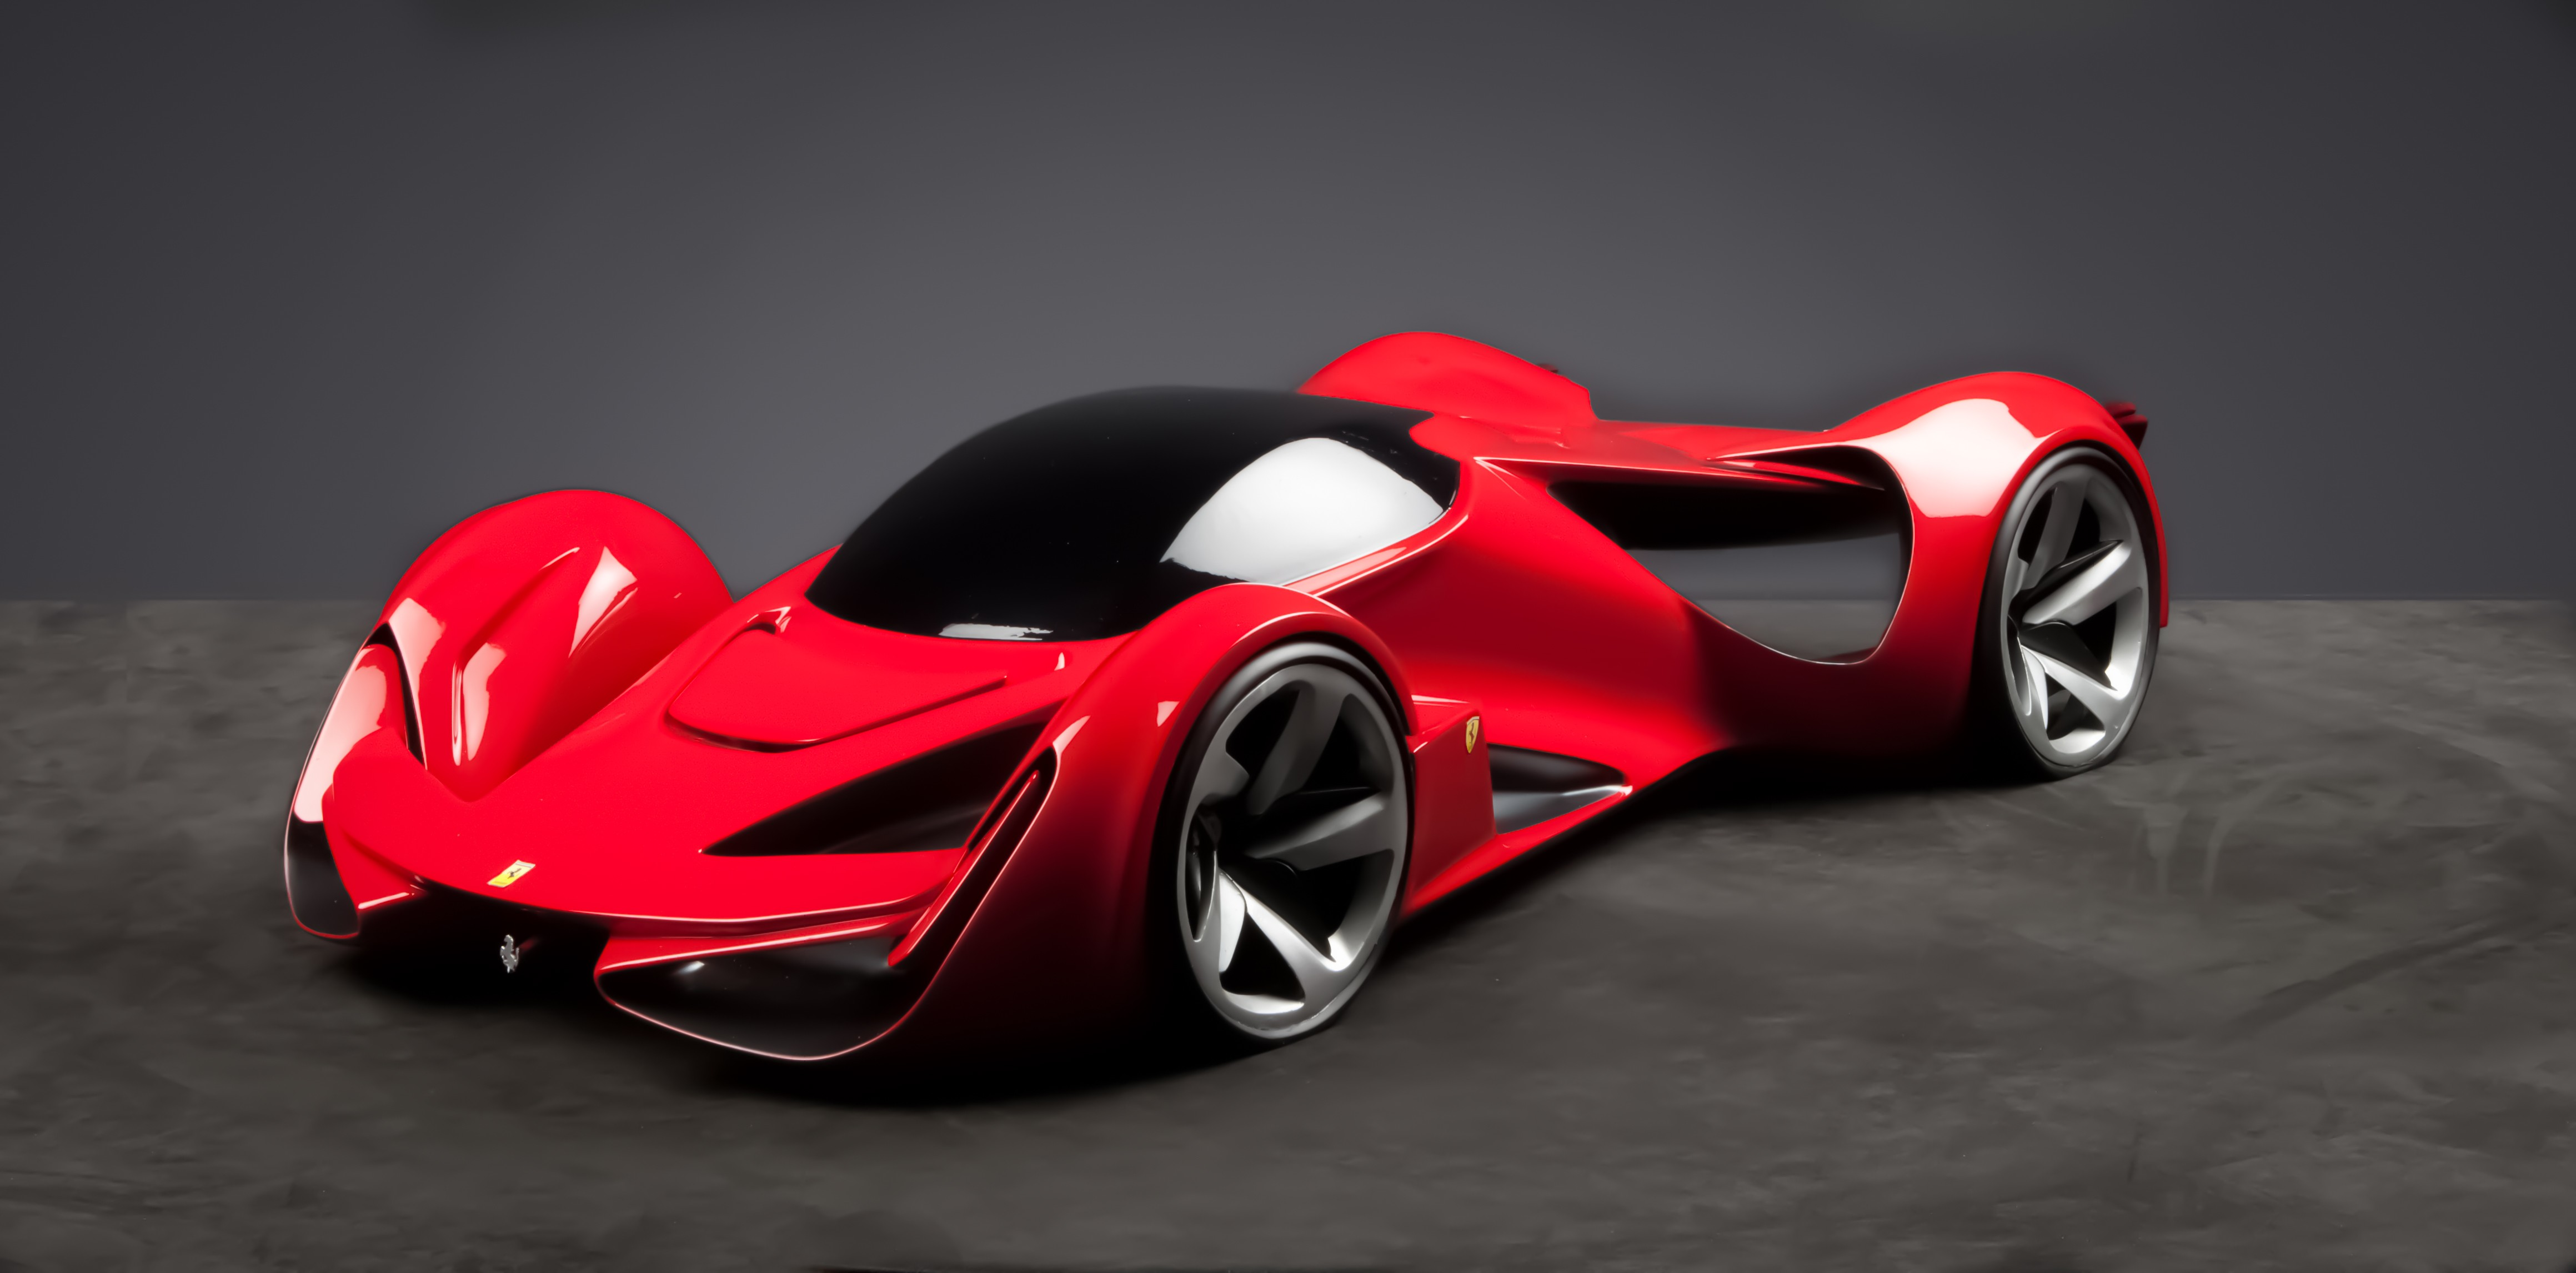 Nissan Luxury Brand >> Wallpaper Ferrari Intervallo, supercar, Ferrari World Design Contest 2016, FWDC, red, Cars ...